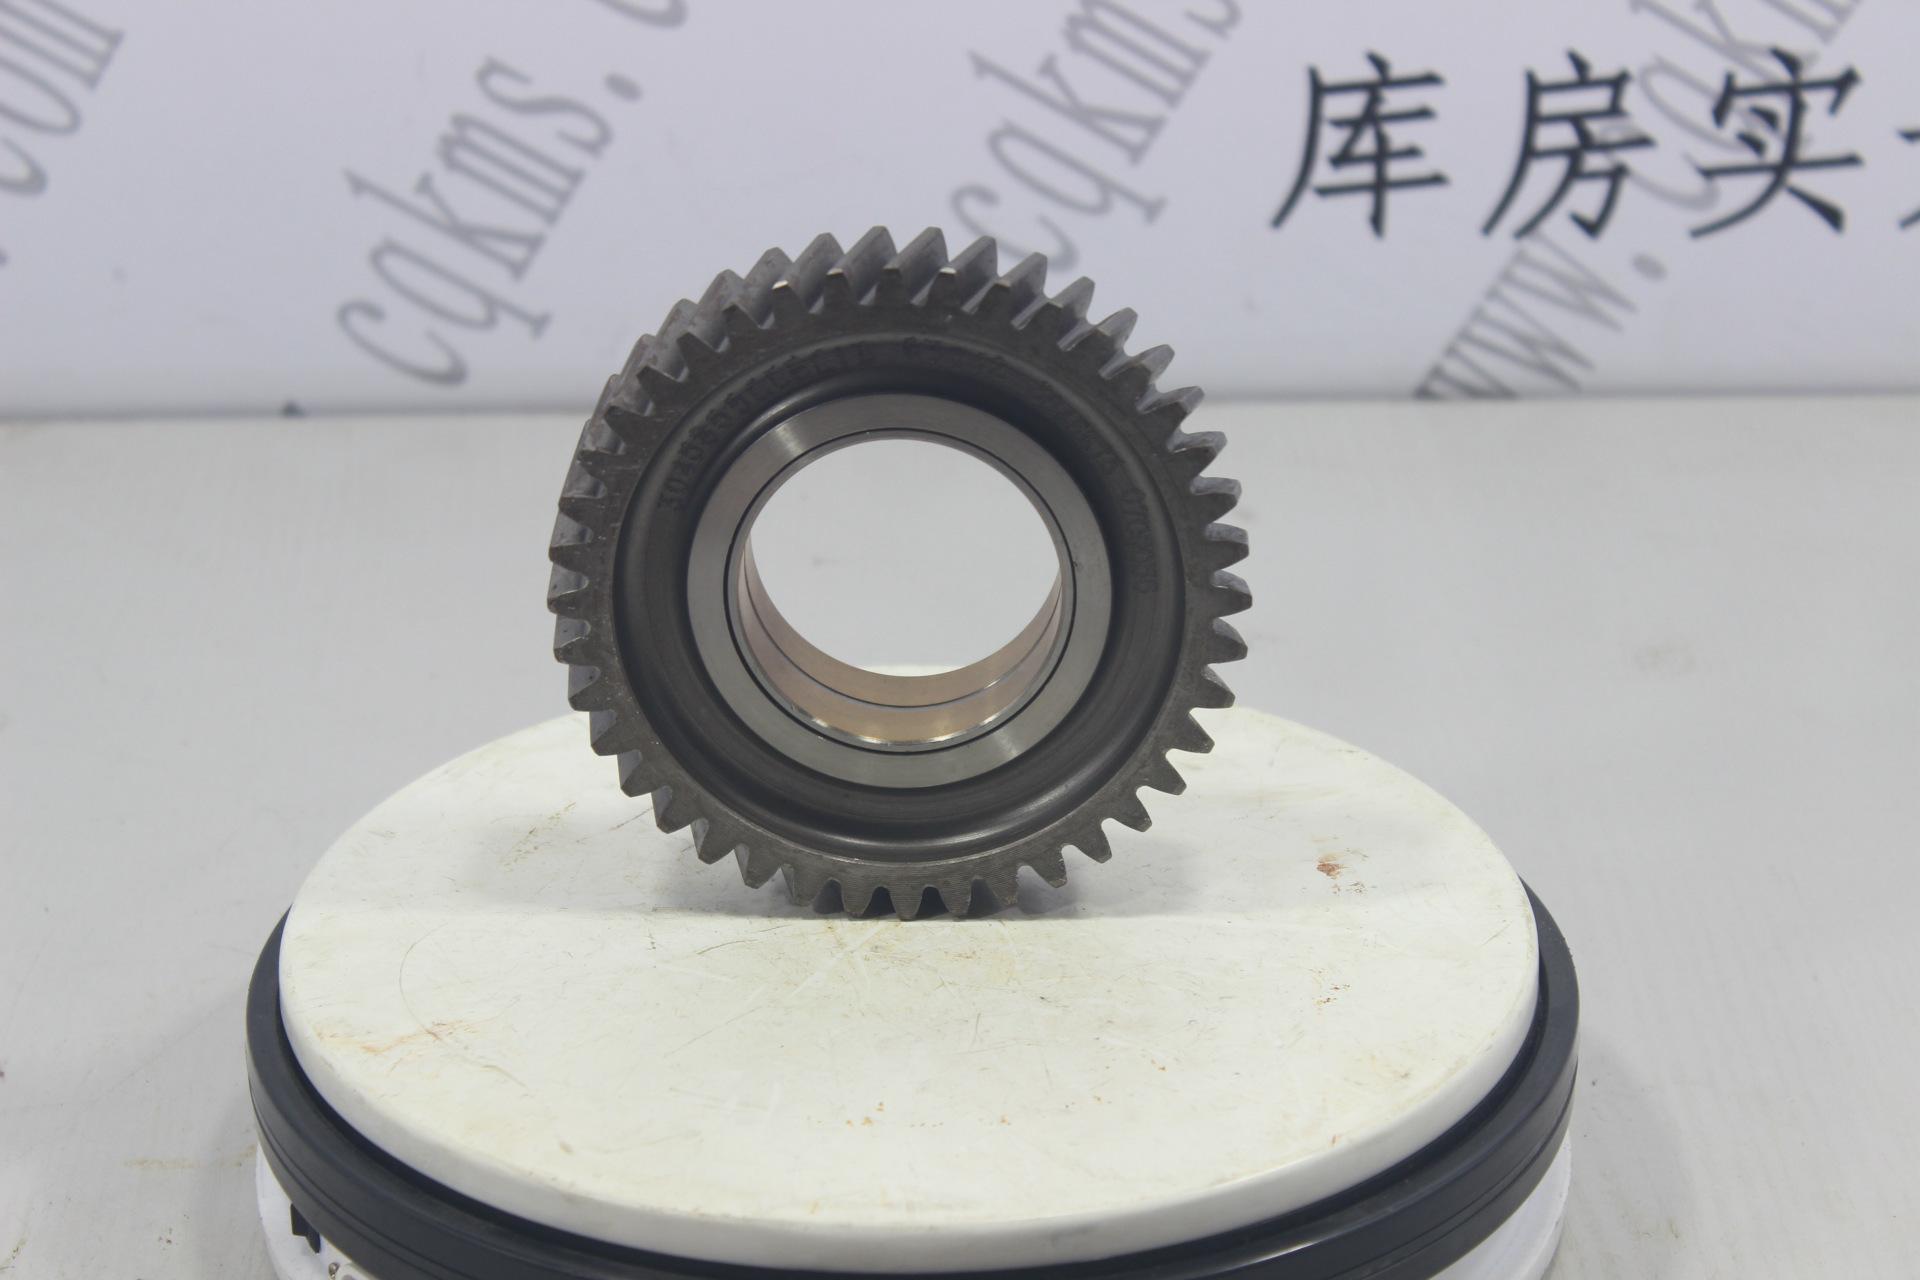 kms00889-3045873-惰齿轮----参考重量1.6Kg-1.6Kg图片5